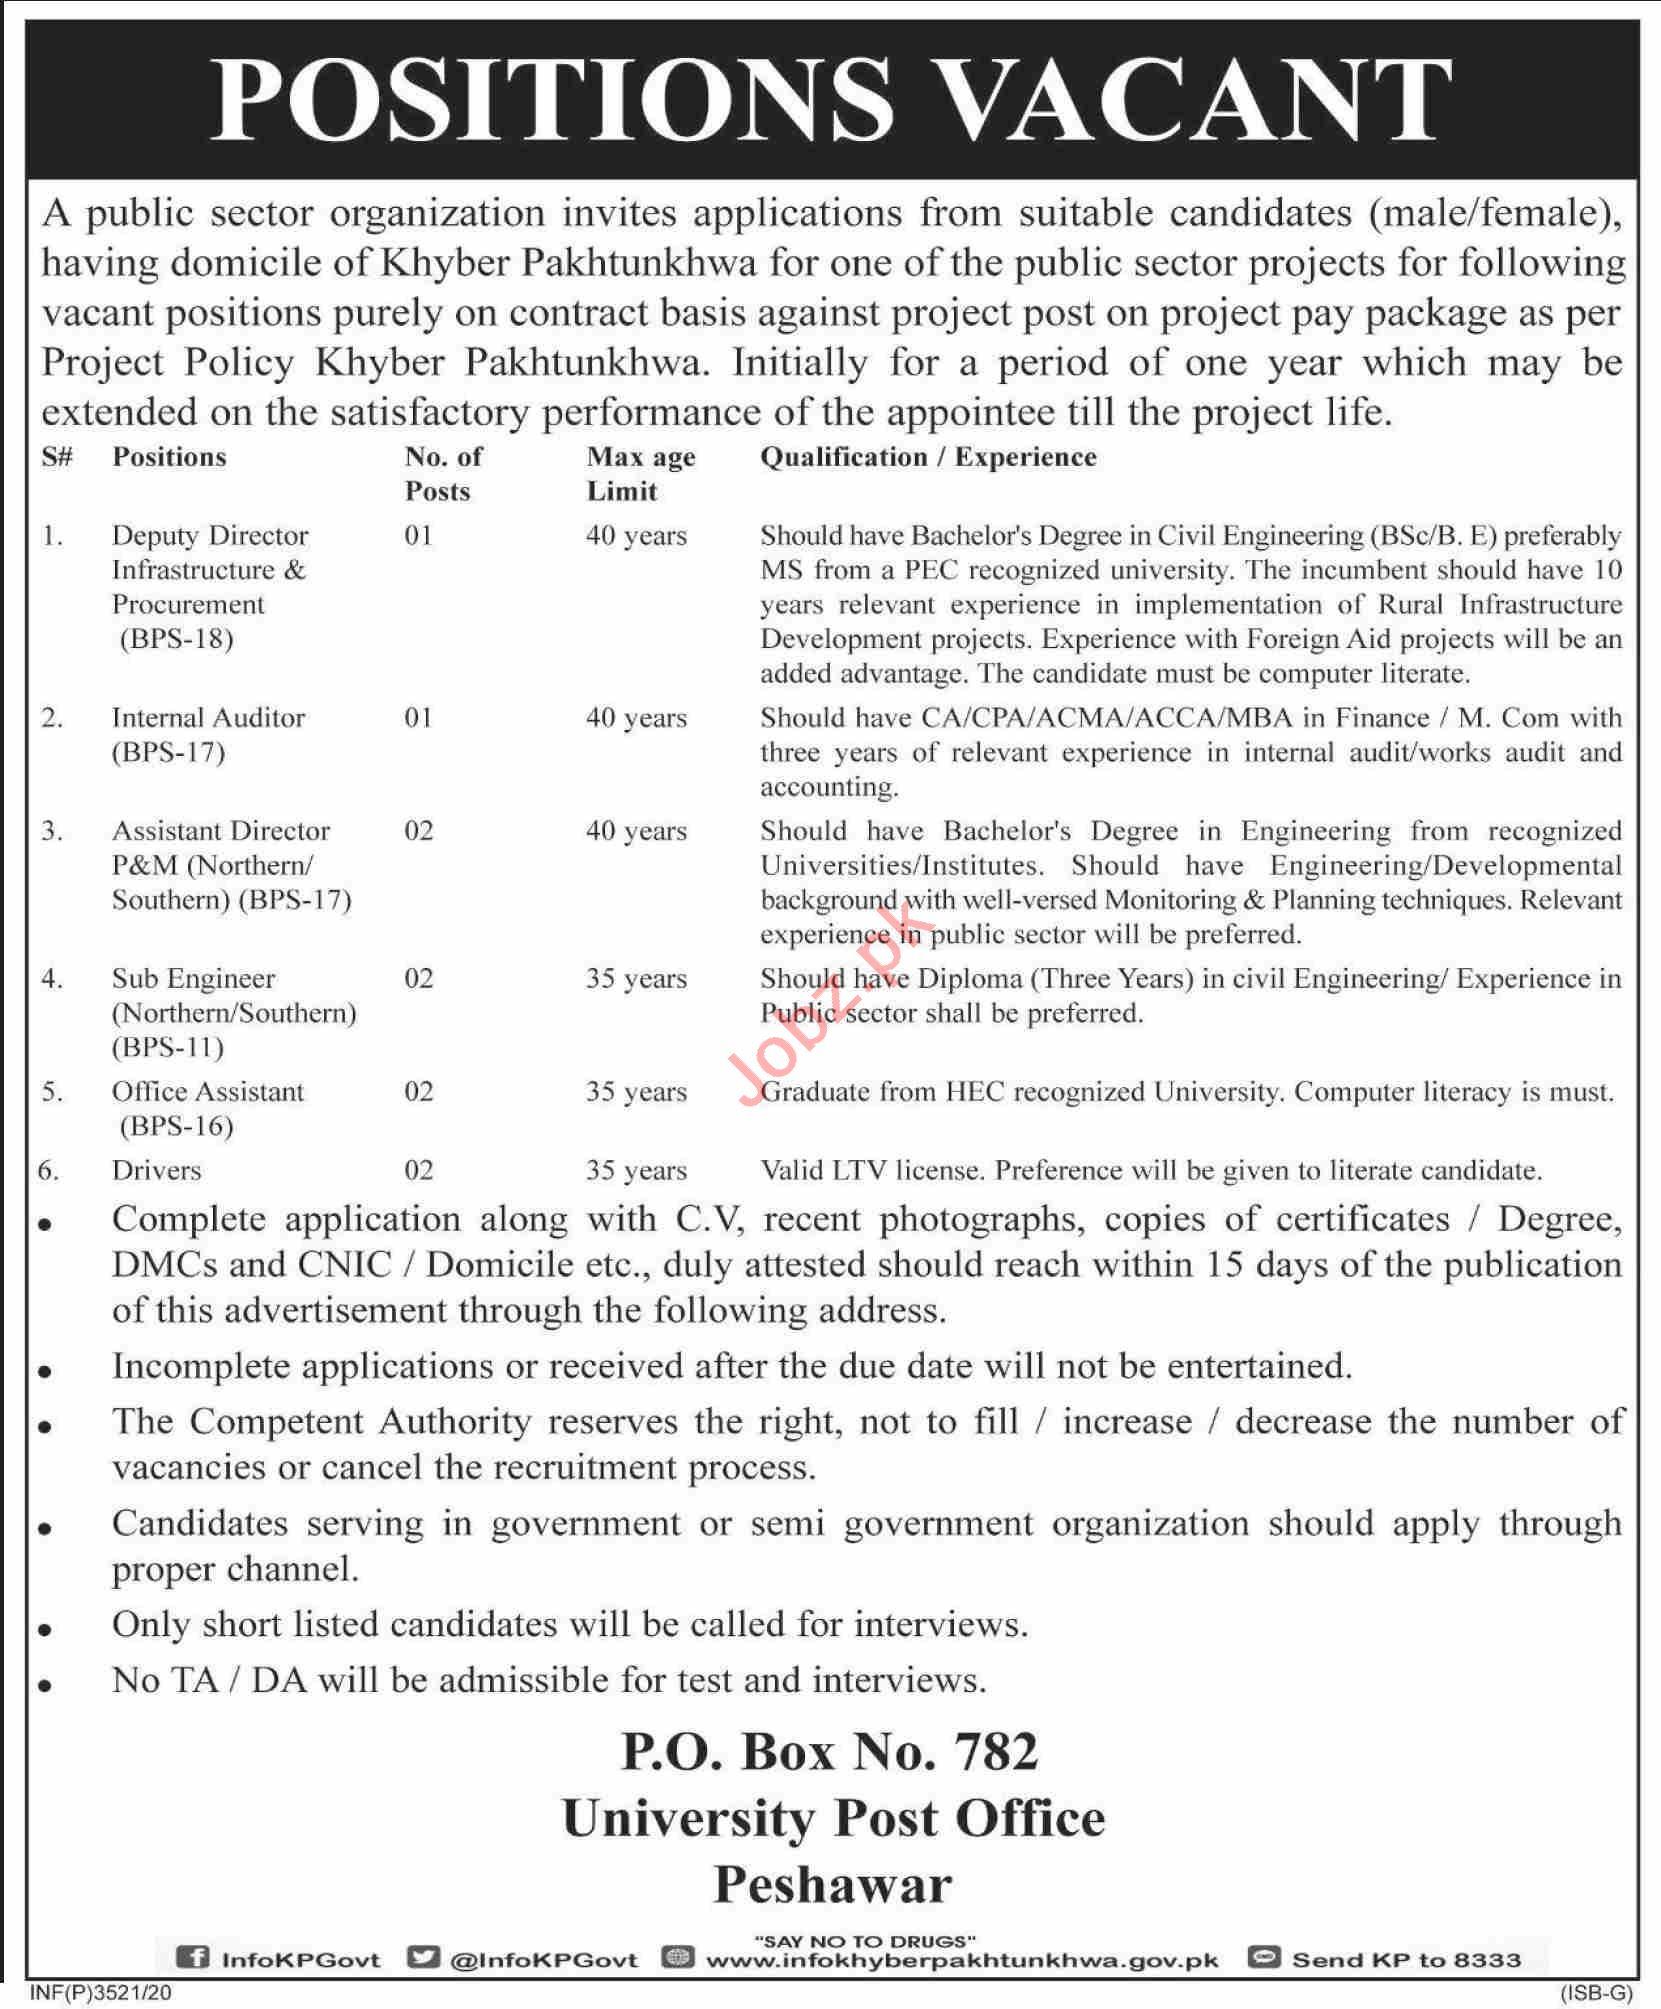 P O Box No 782 University Post Office Peshawar Jobs 2020